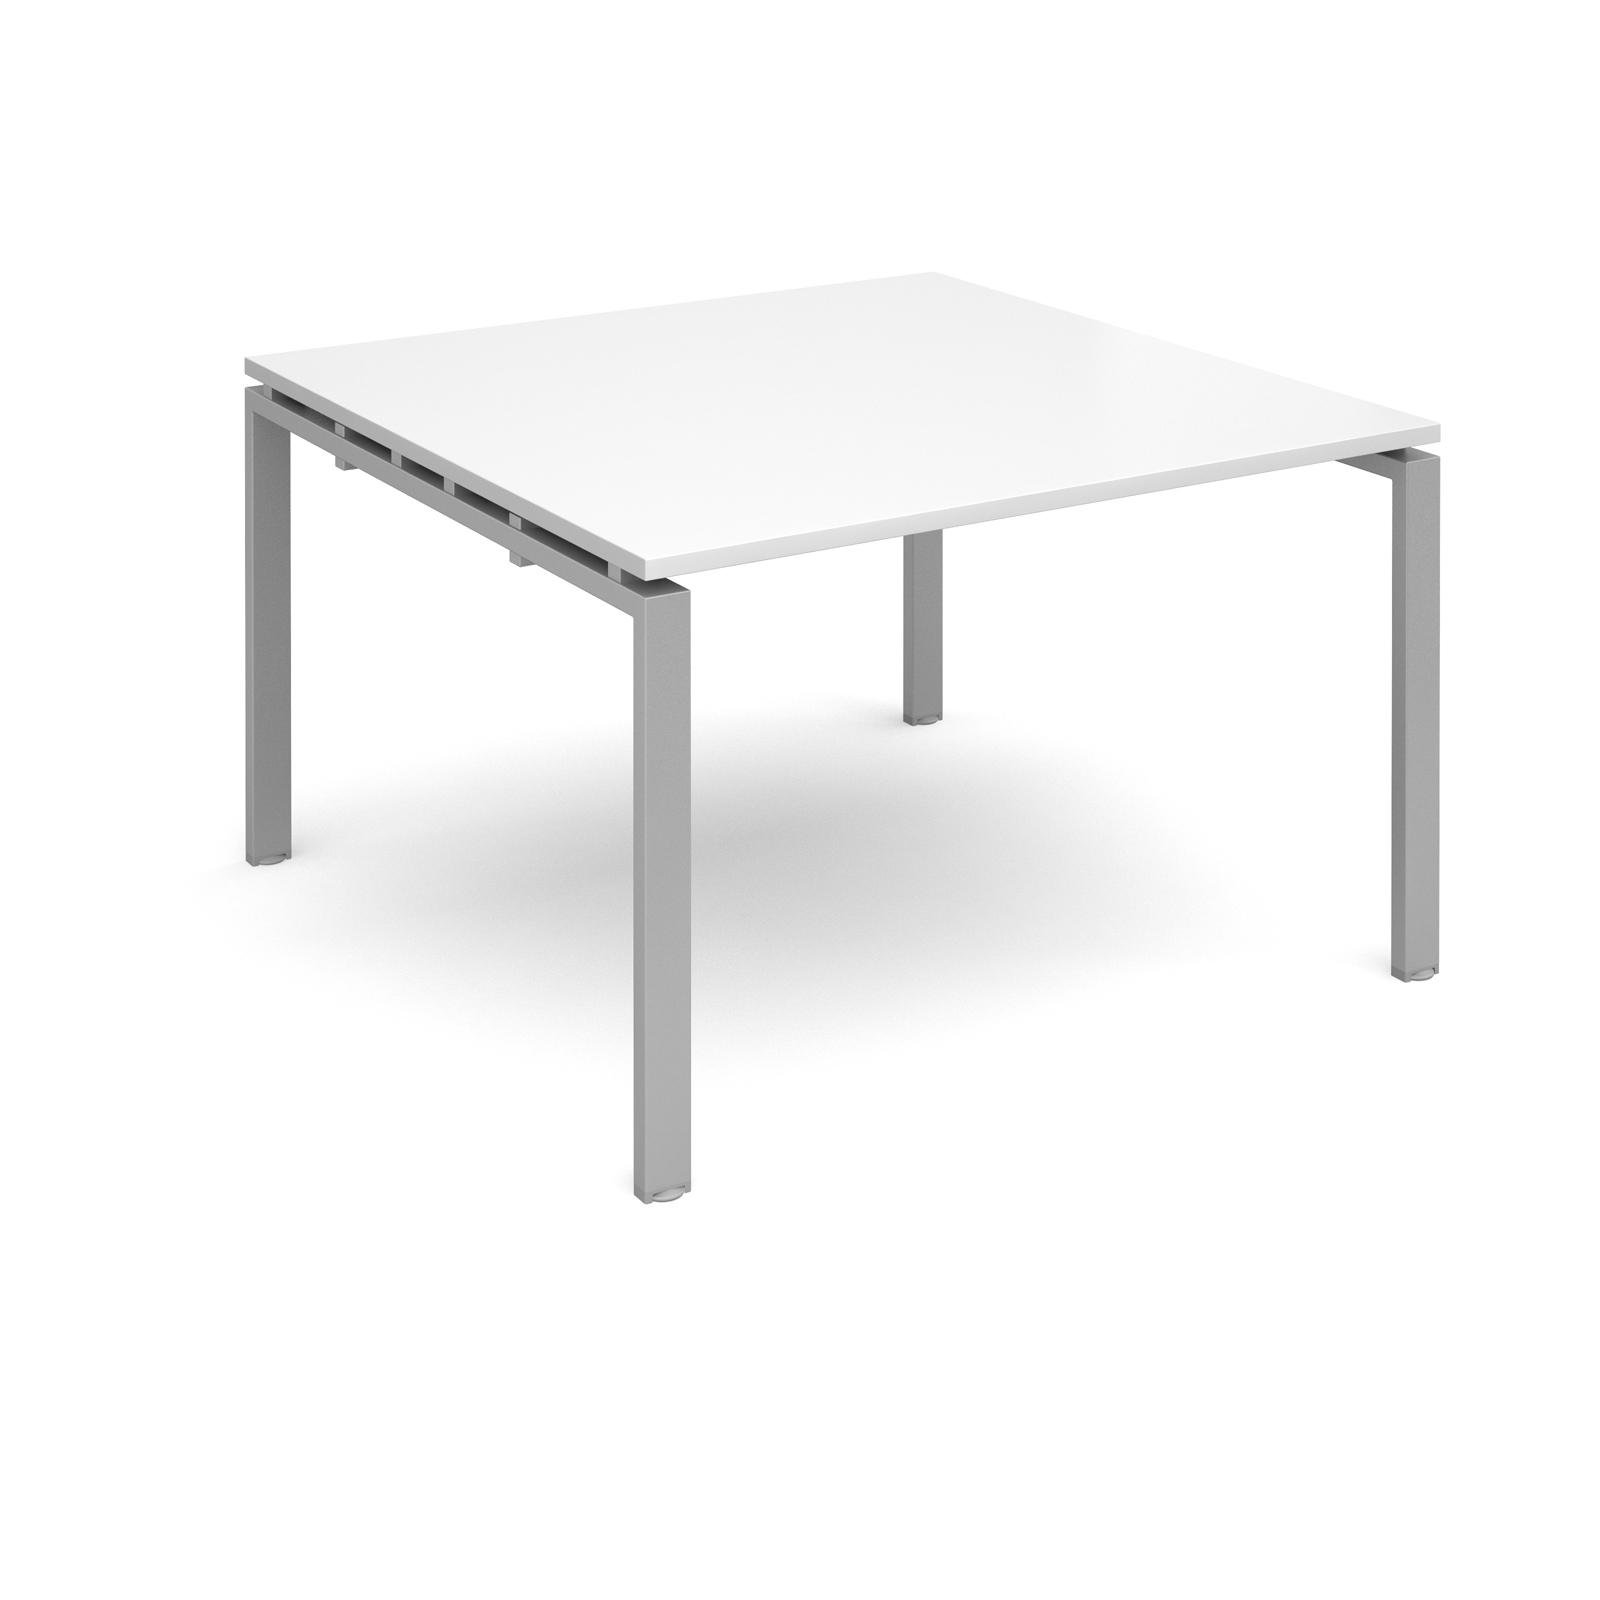 Adapt boardroom table starter unit